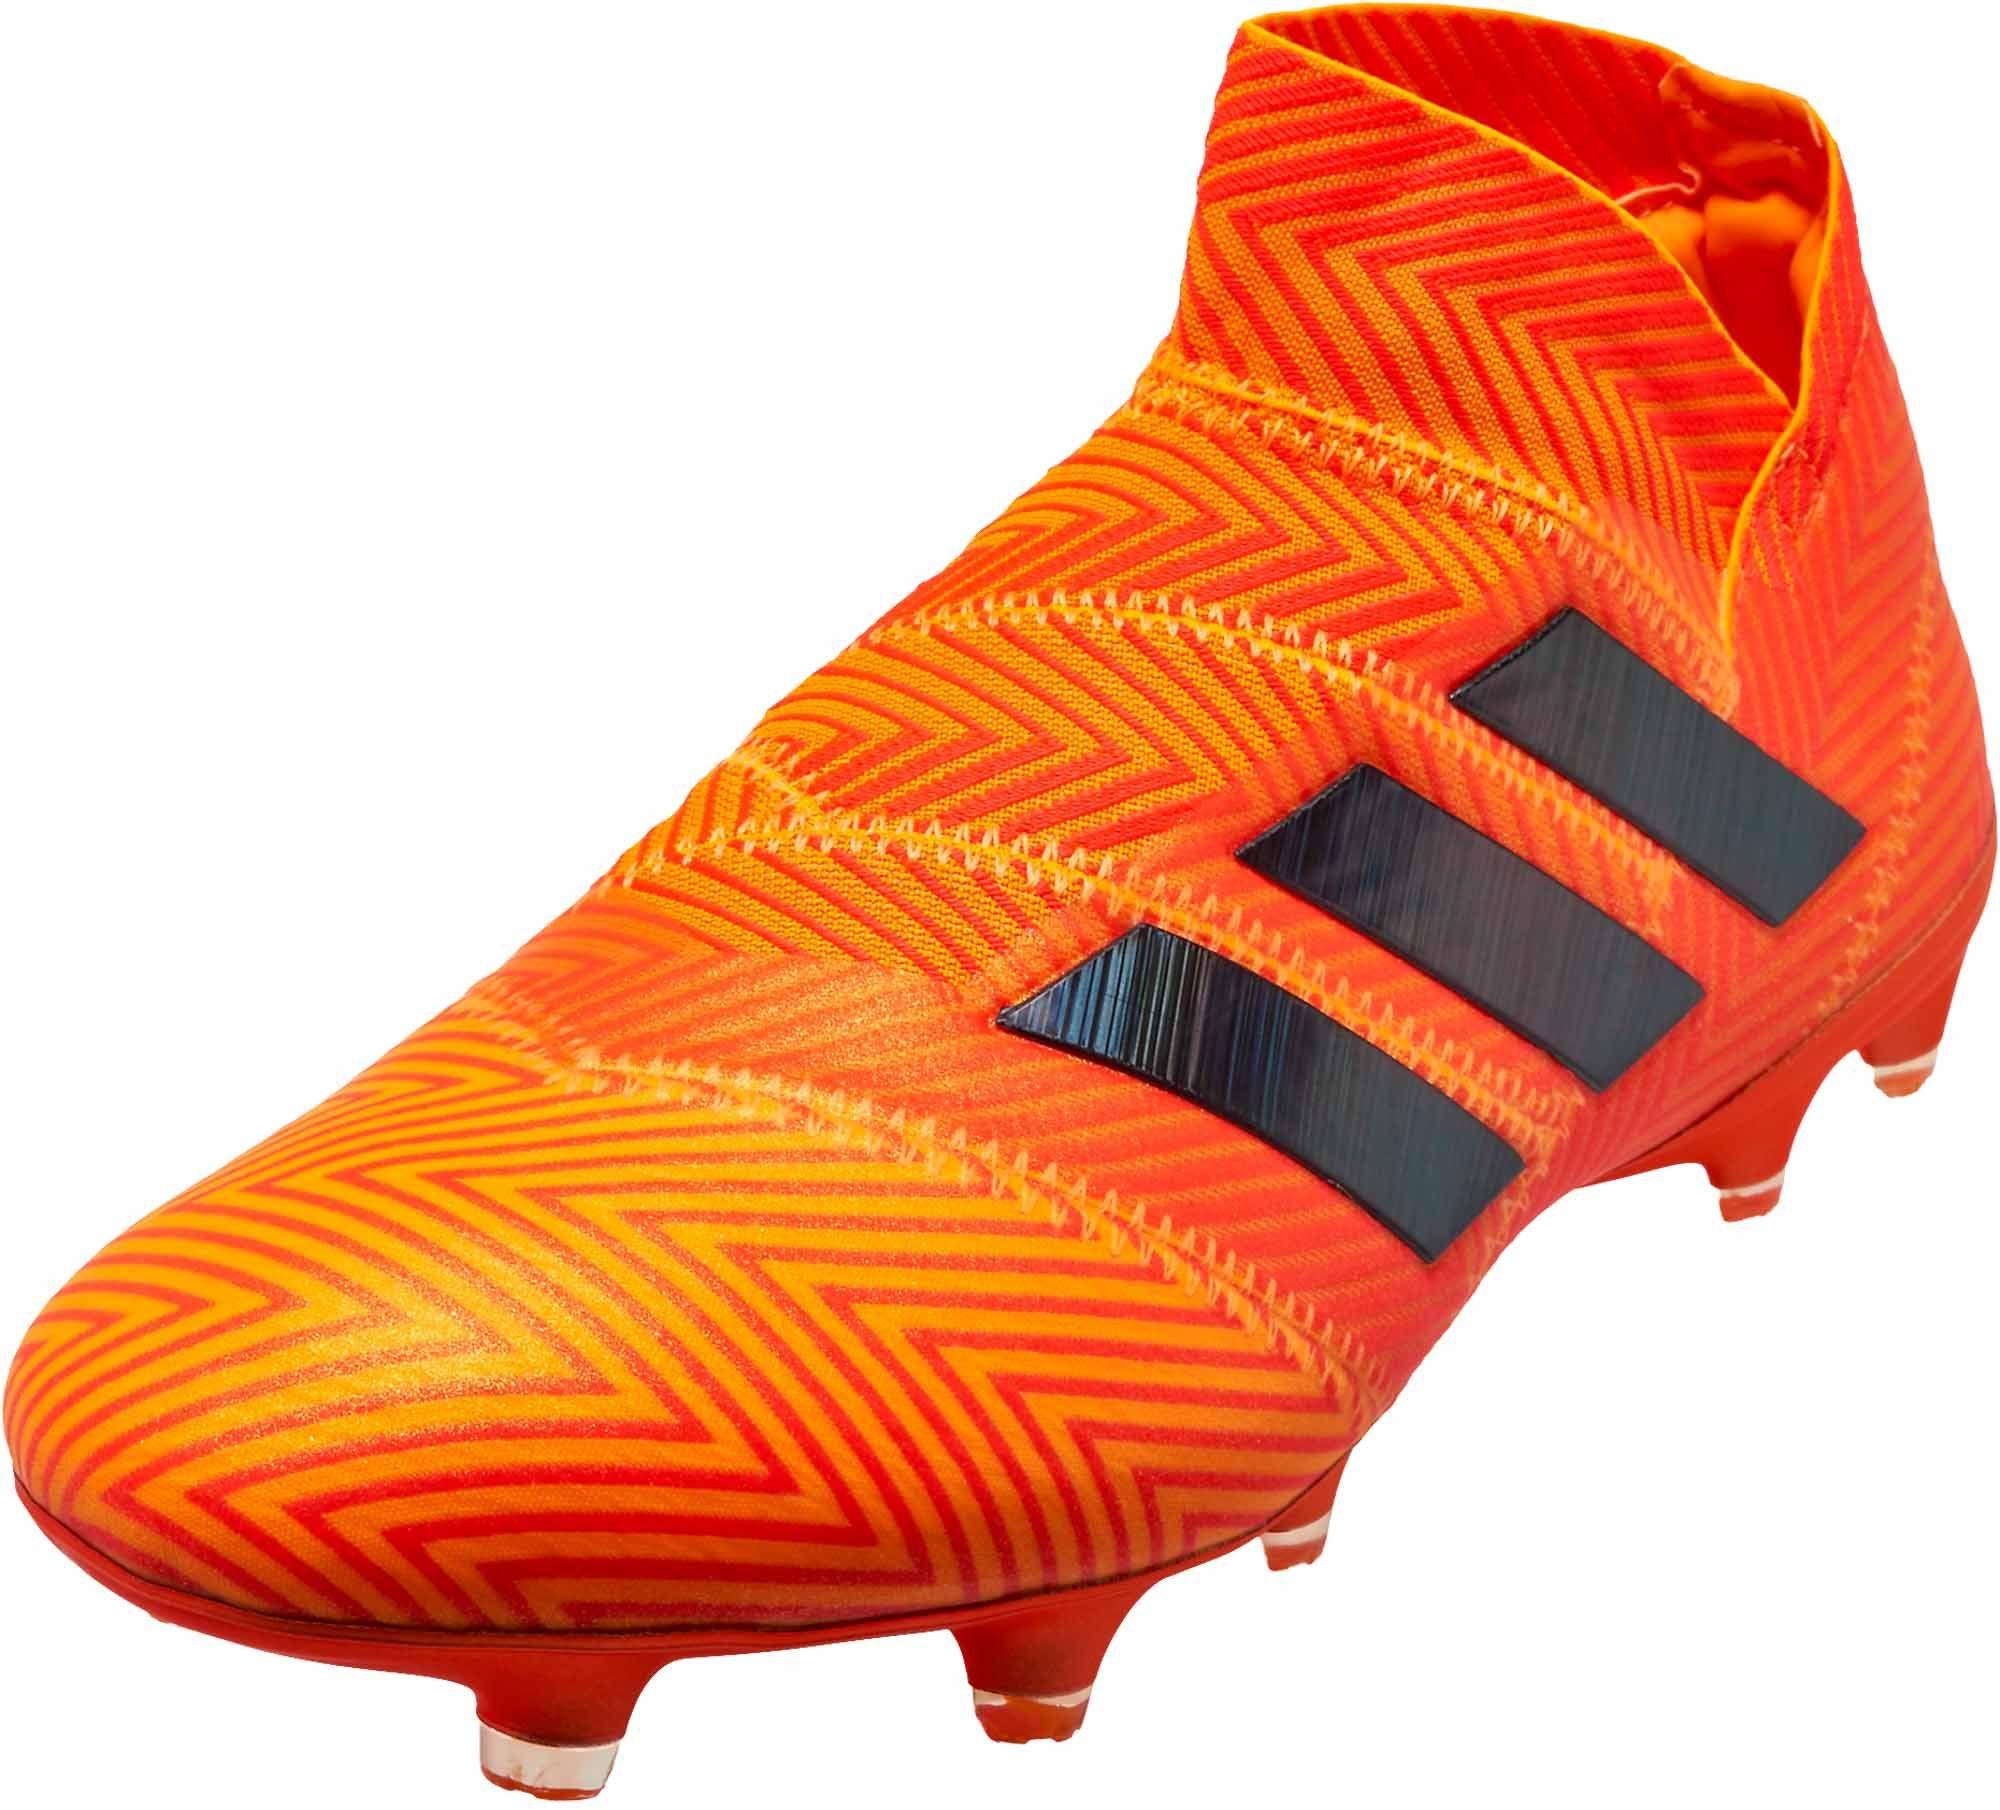 46f0493268503 Energy Mode pack adidas Nemeziz 18+ Hot at www.soccerpro.com Tacos De